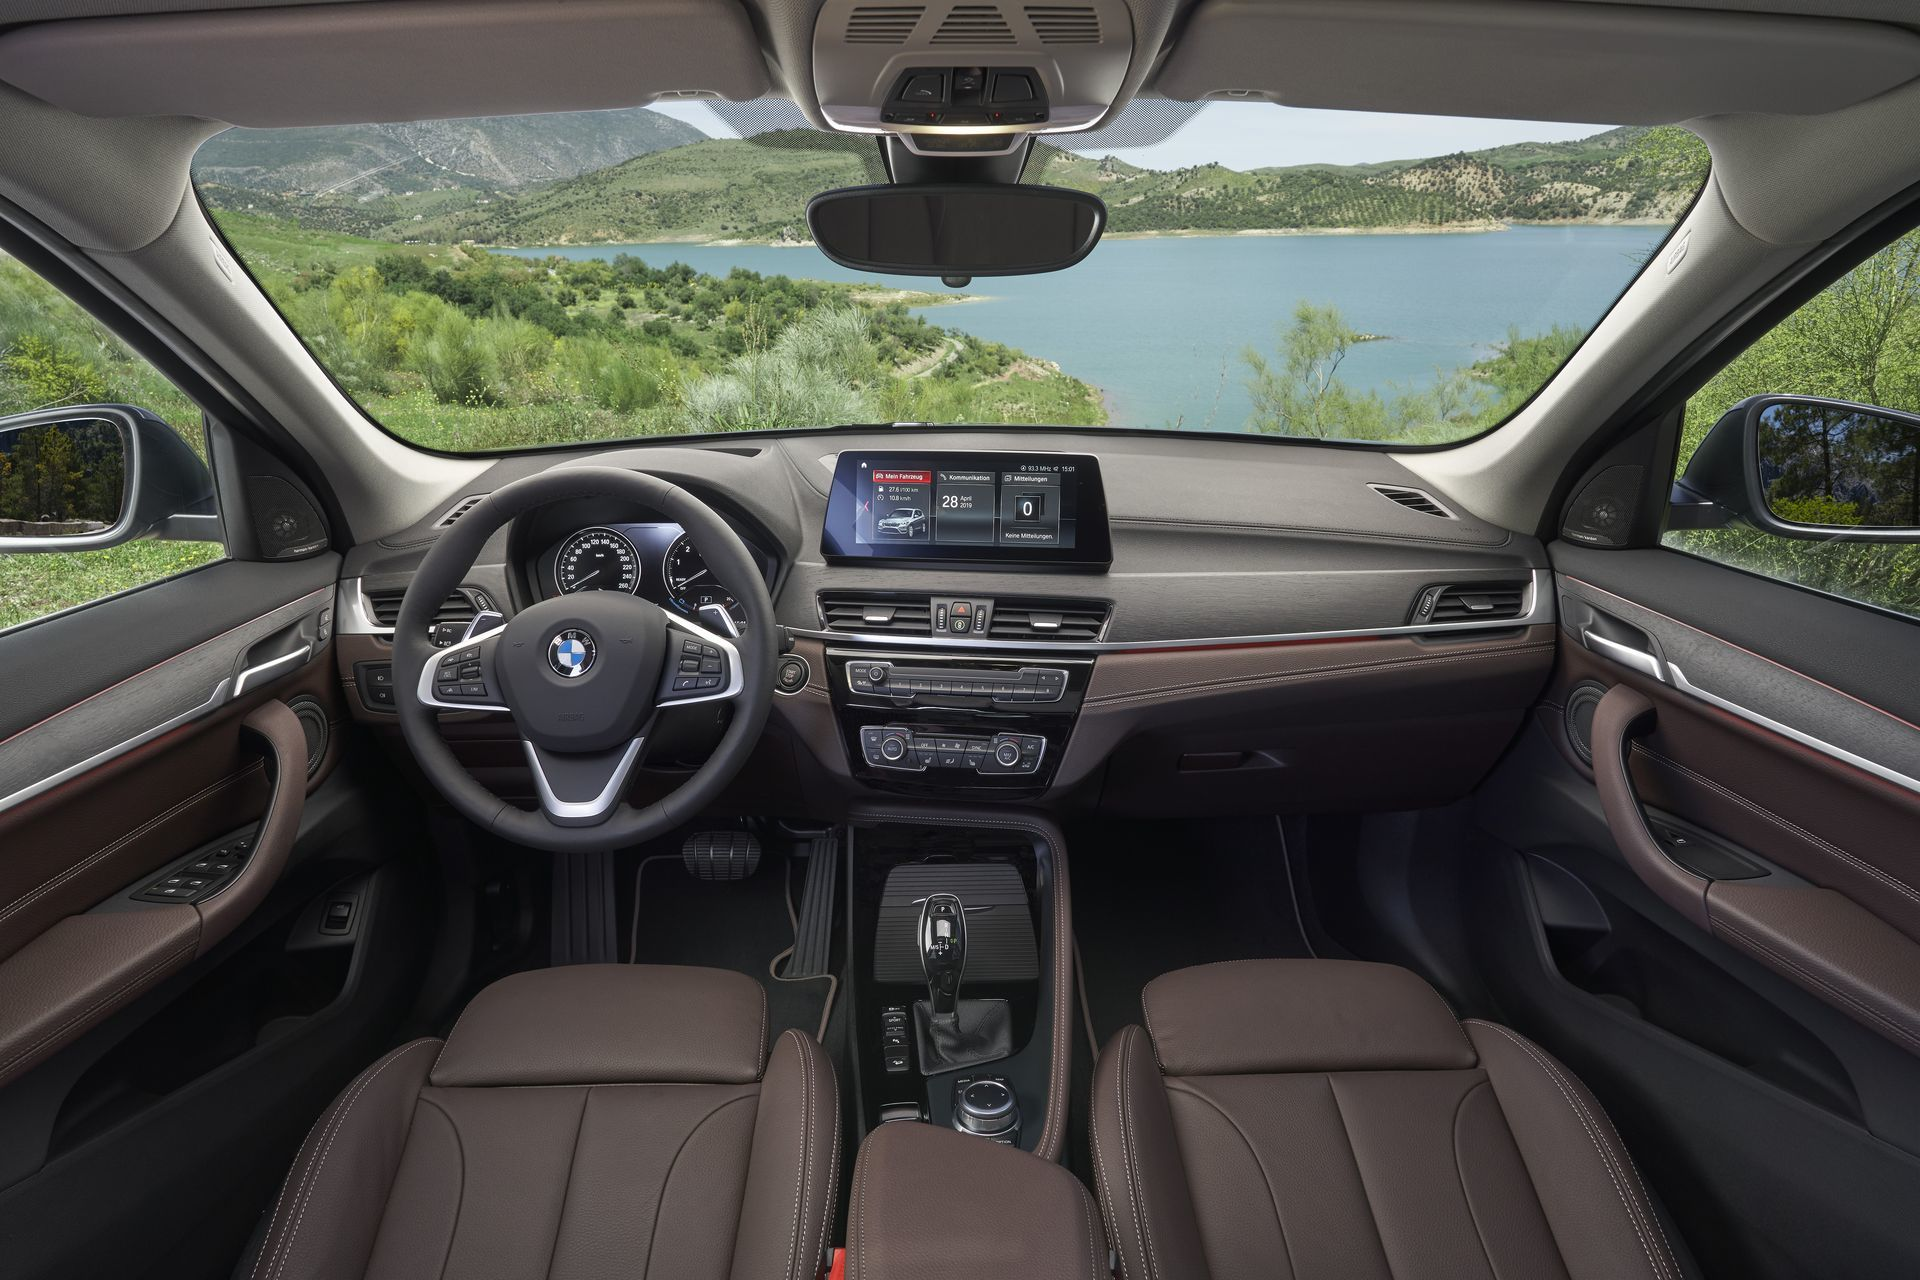 Bmw X1 2019 2 Interior